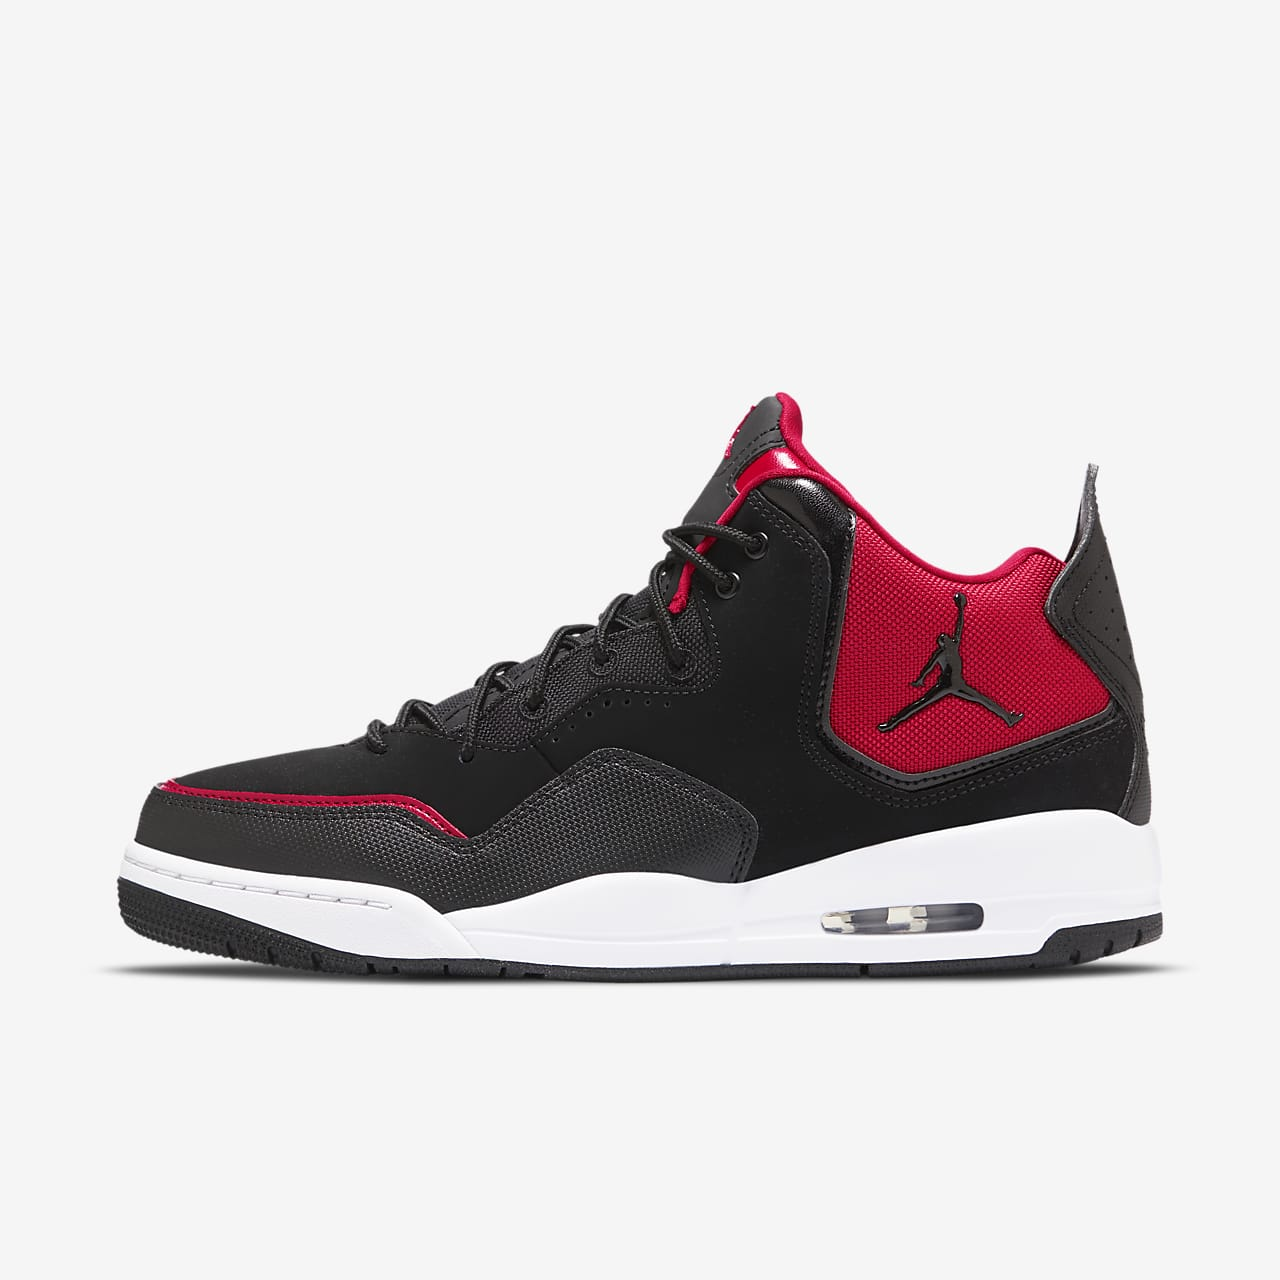 new style 5b64b 2853f Jordan Courtside 23 Zapatillas - Hombre